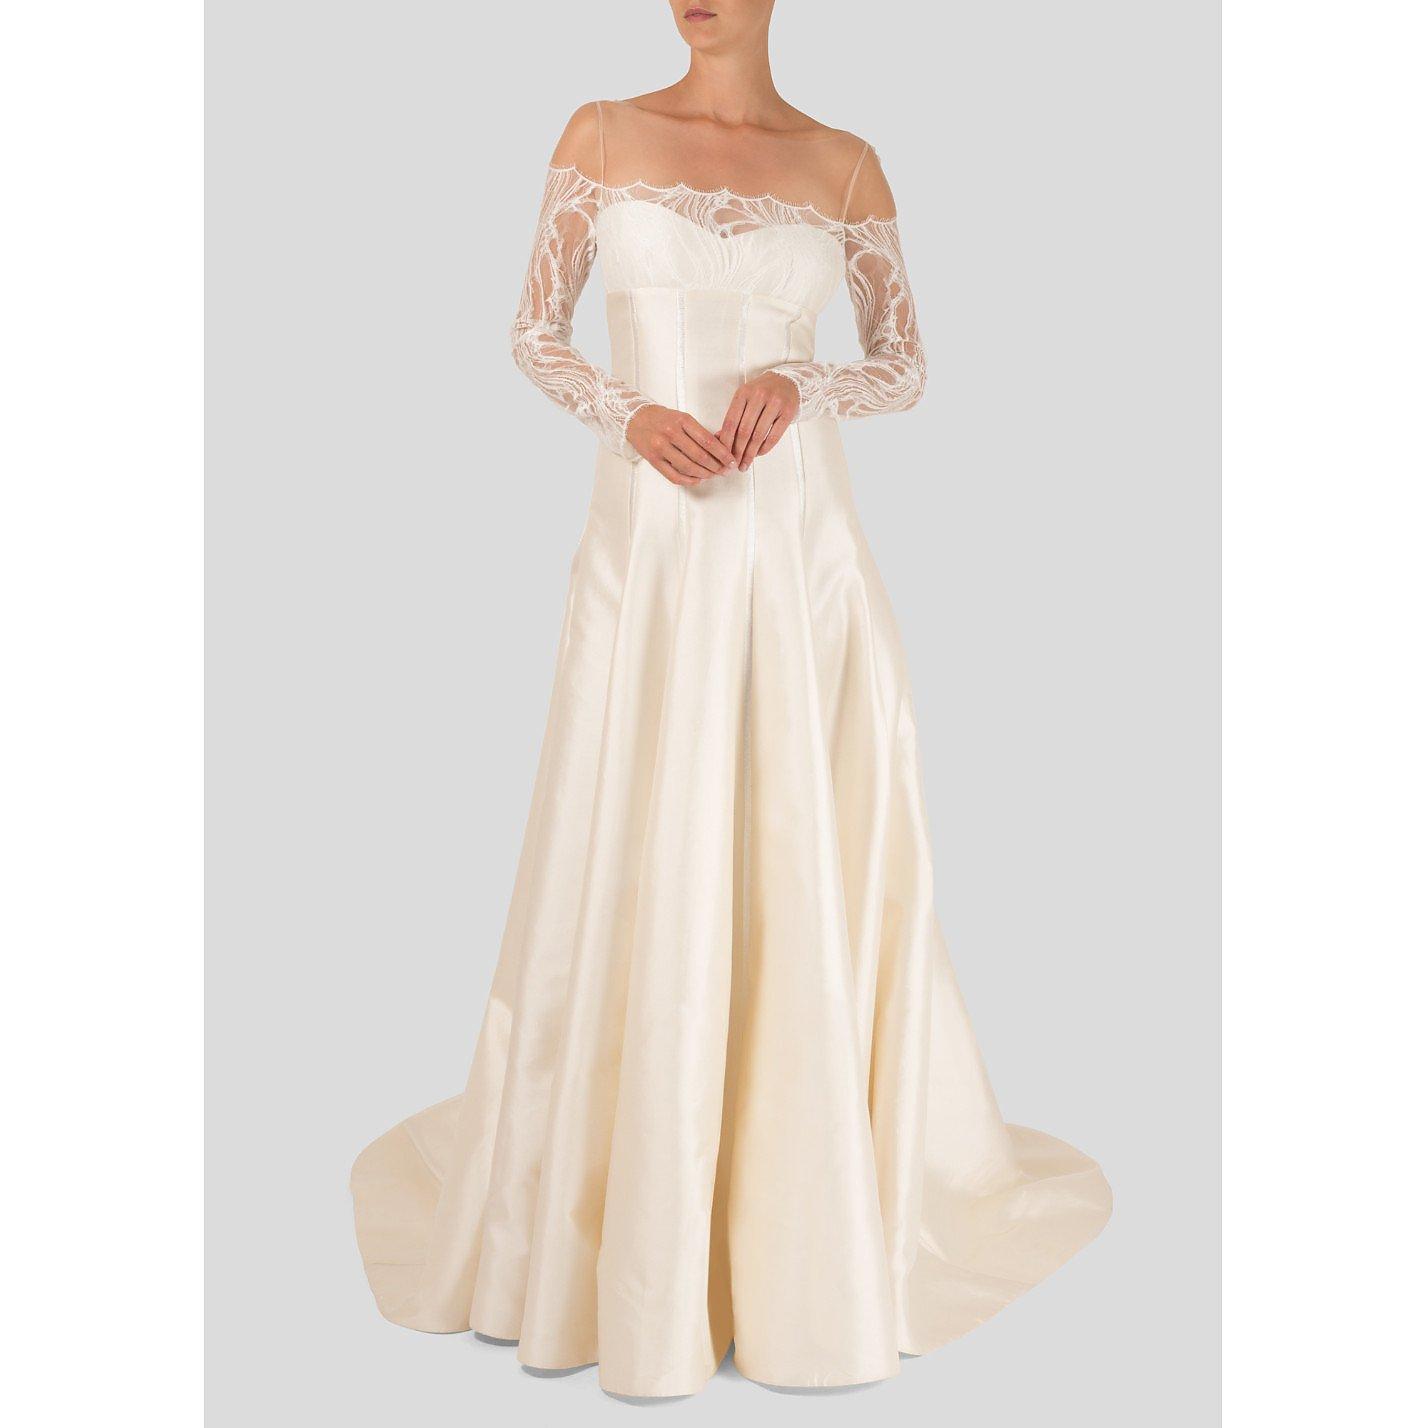 Amanda Wakeley Bridal Bella Bridal Dress